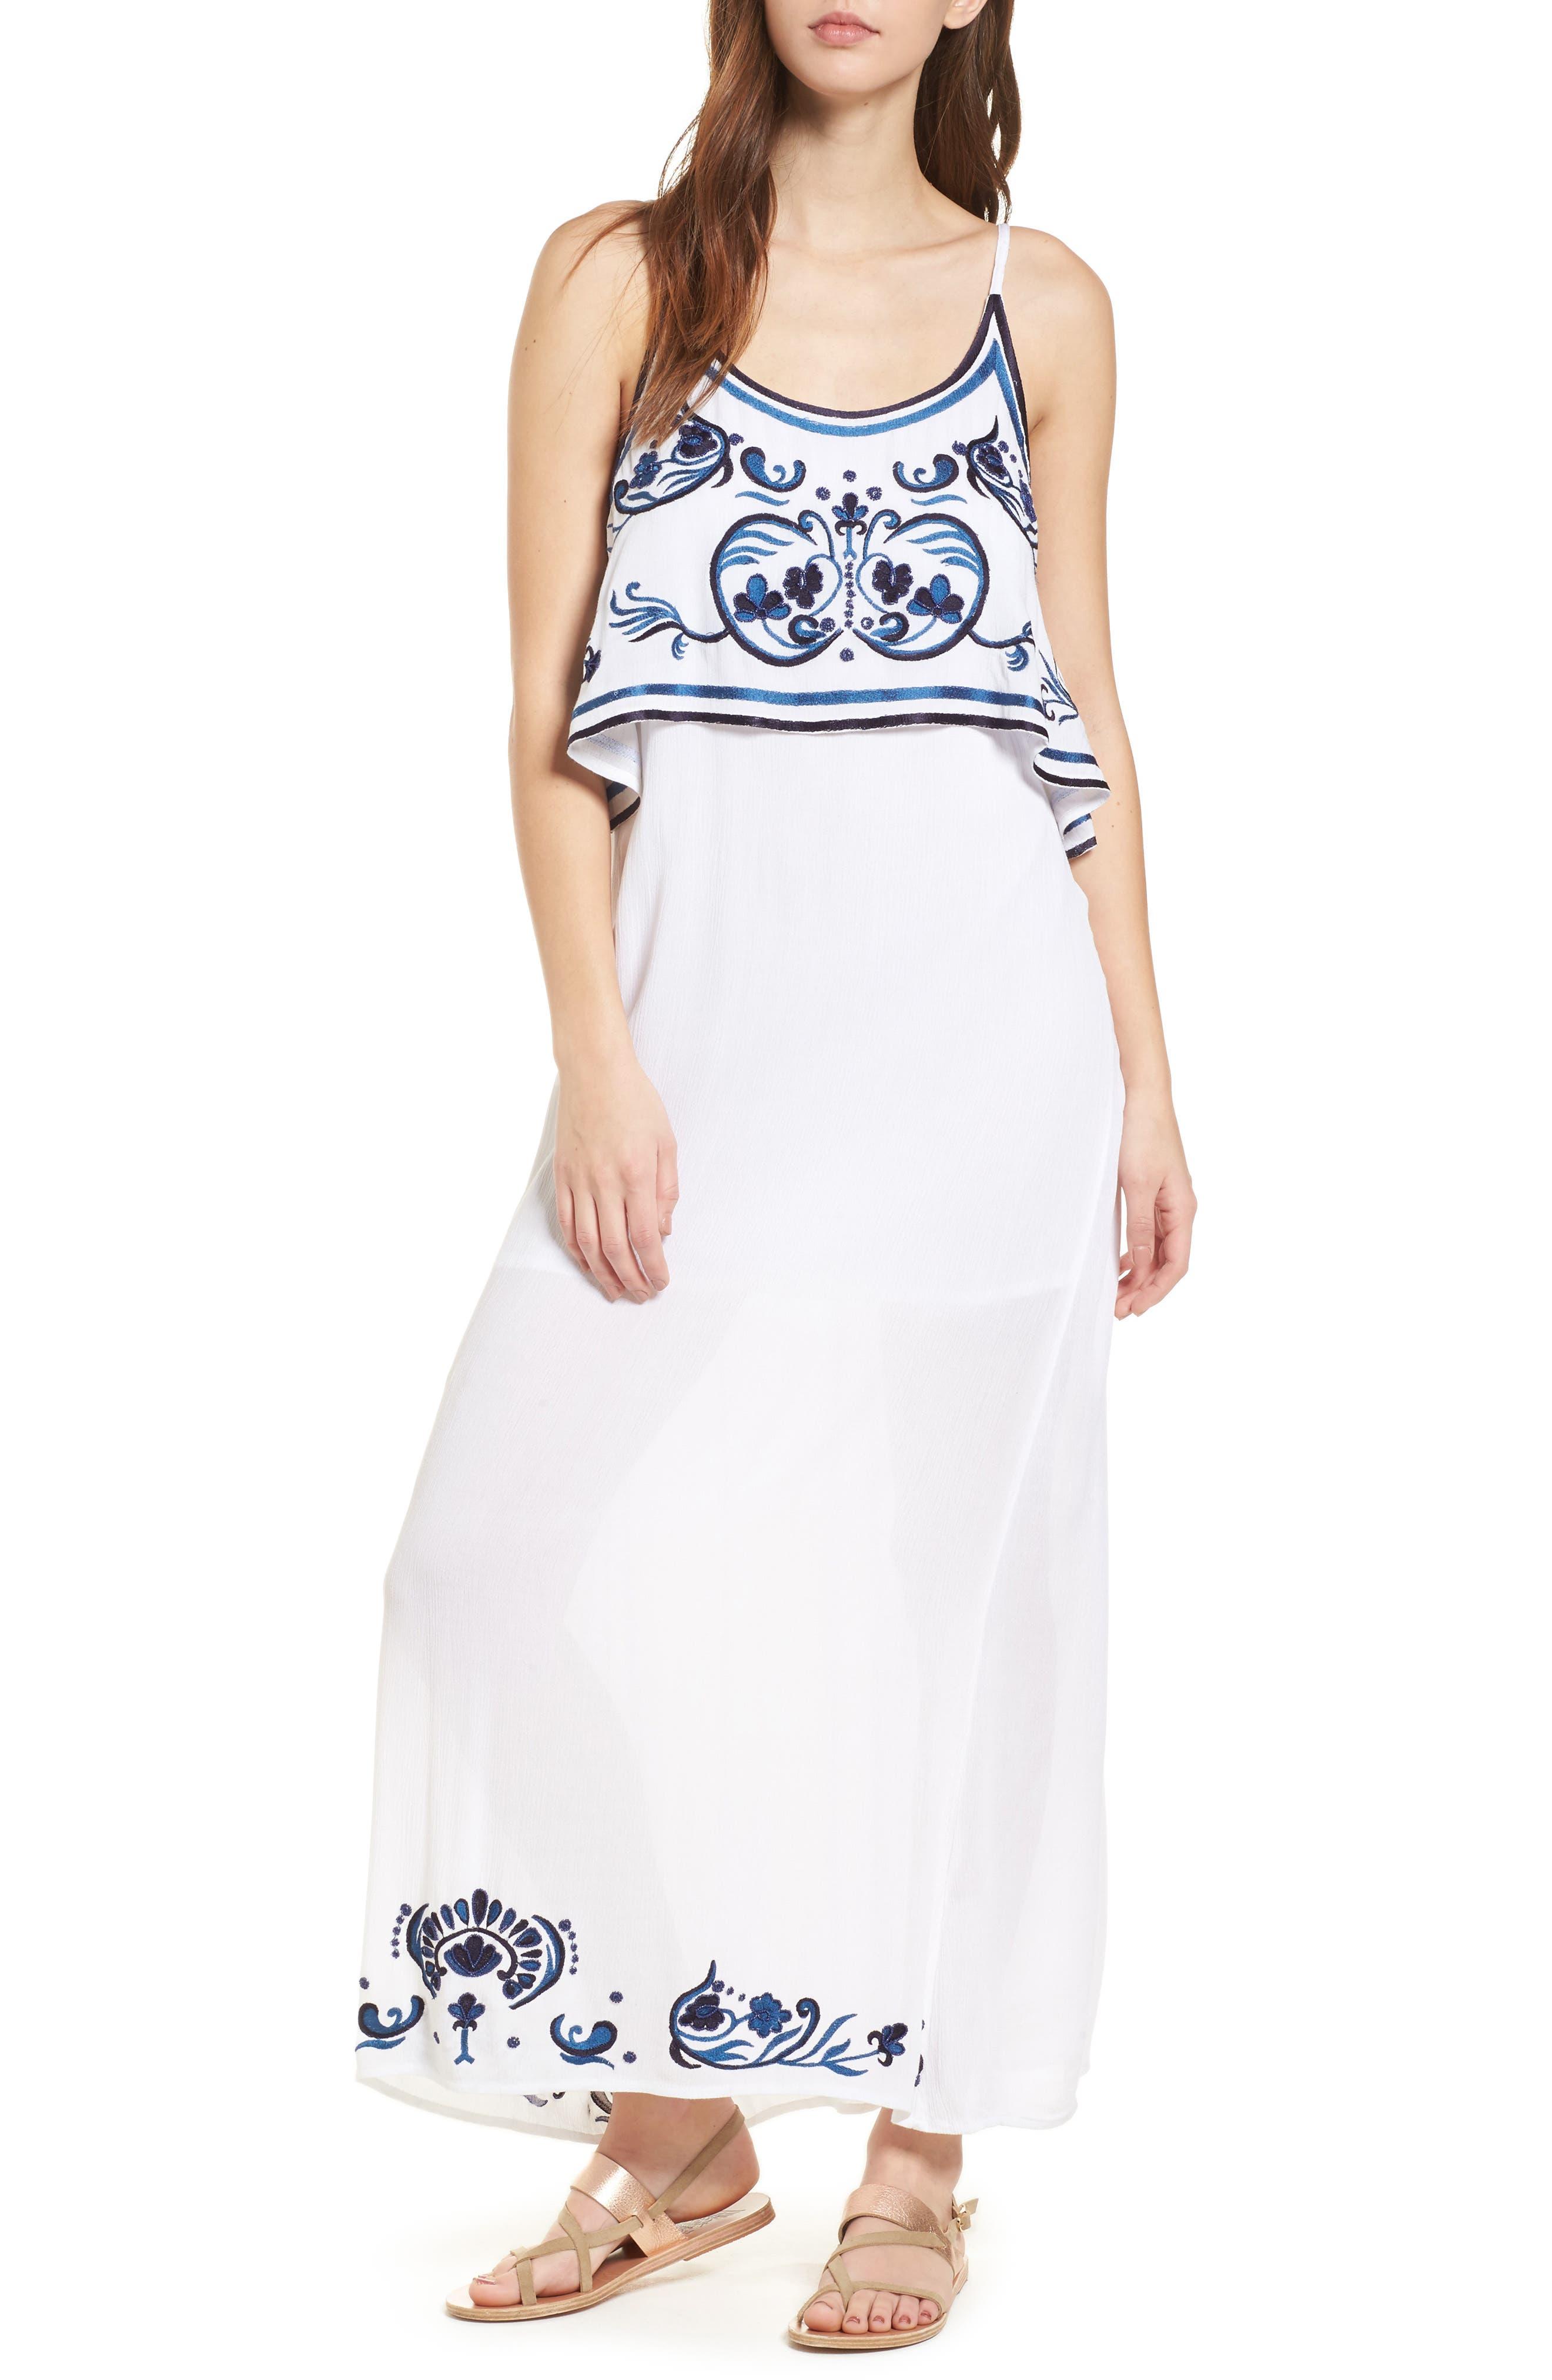 Mediterranean Embroidered Maxi Dress,                         Main,                         color, White/ Blue